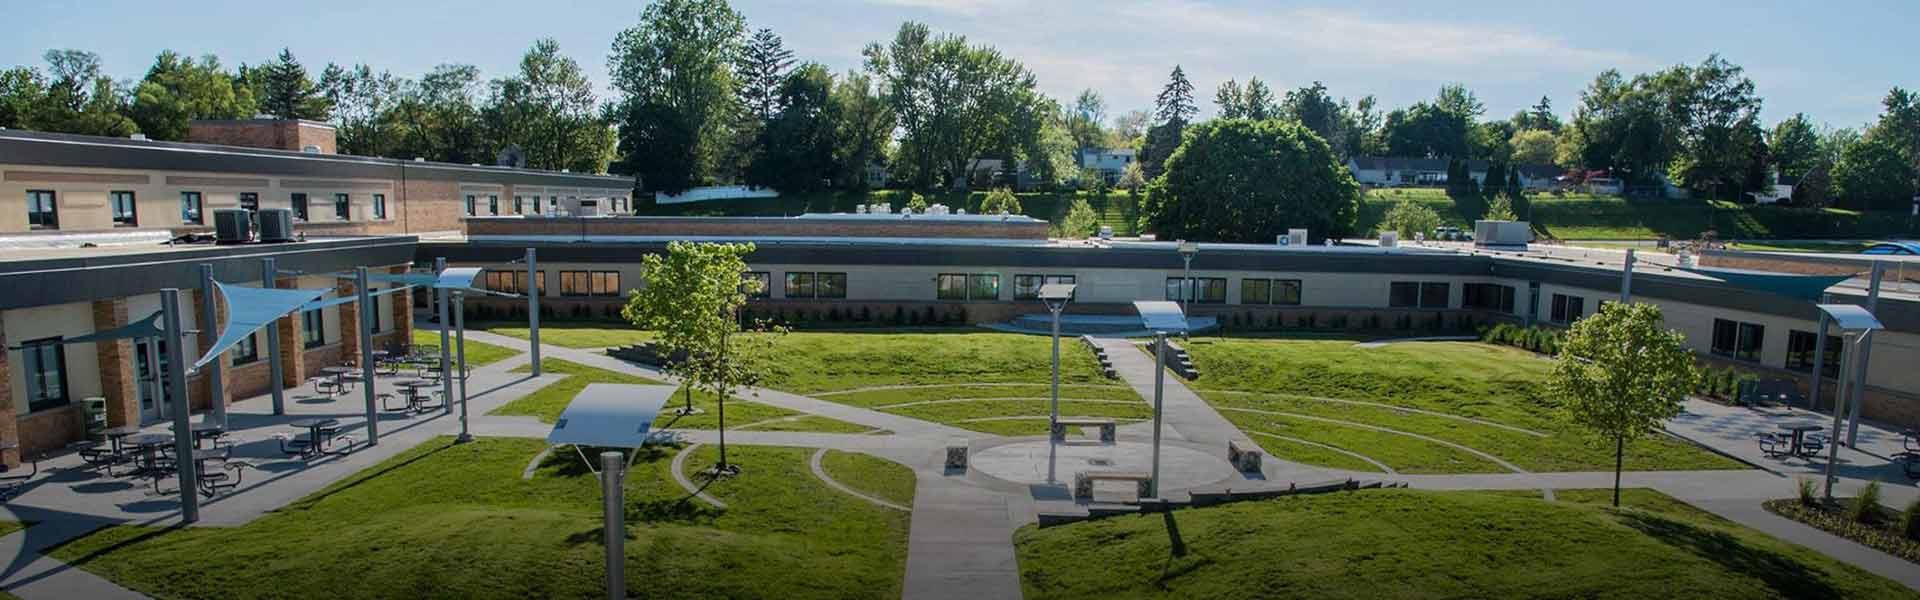 Campus picture of Adrian High School in Michigan